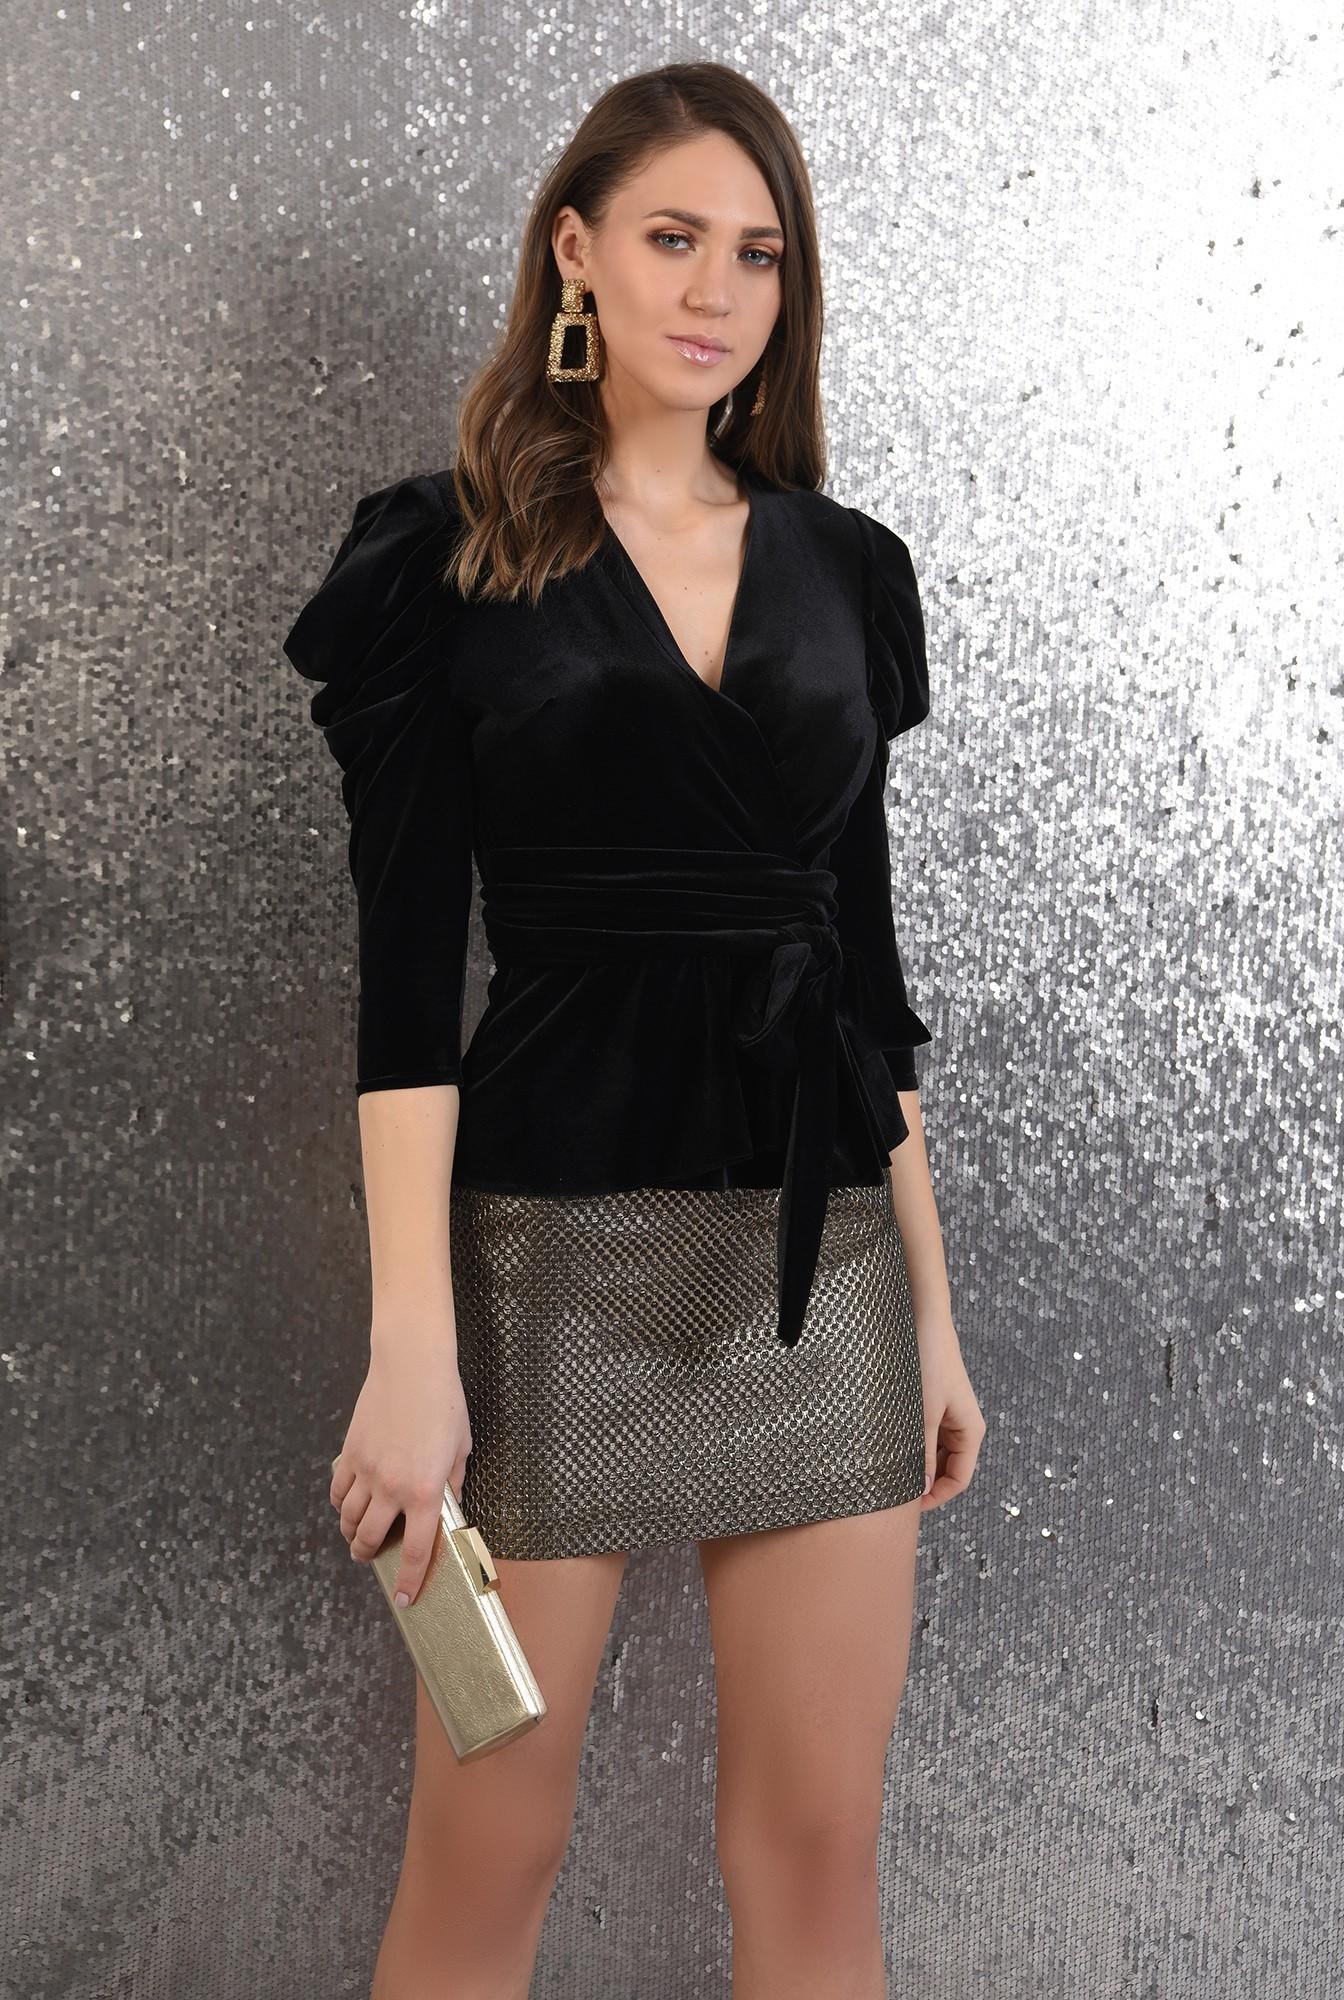 0 -  360 - bluza eleganta, cu anchior, maneci cu cret la umar, funda la talie